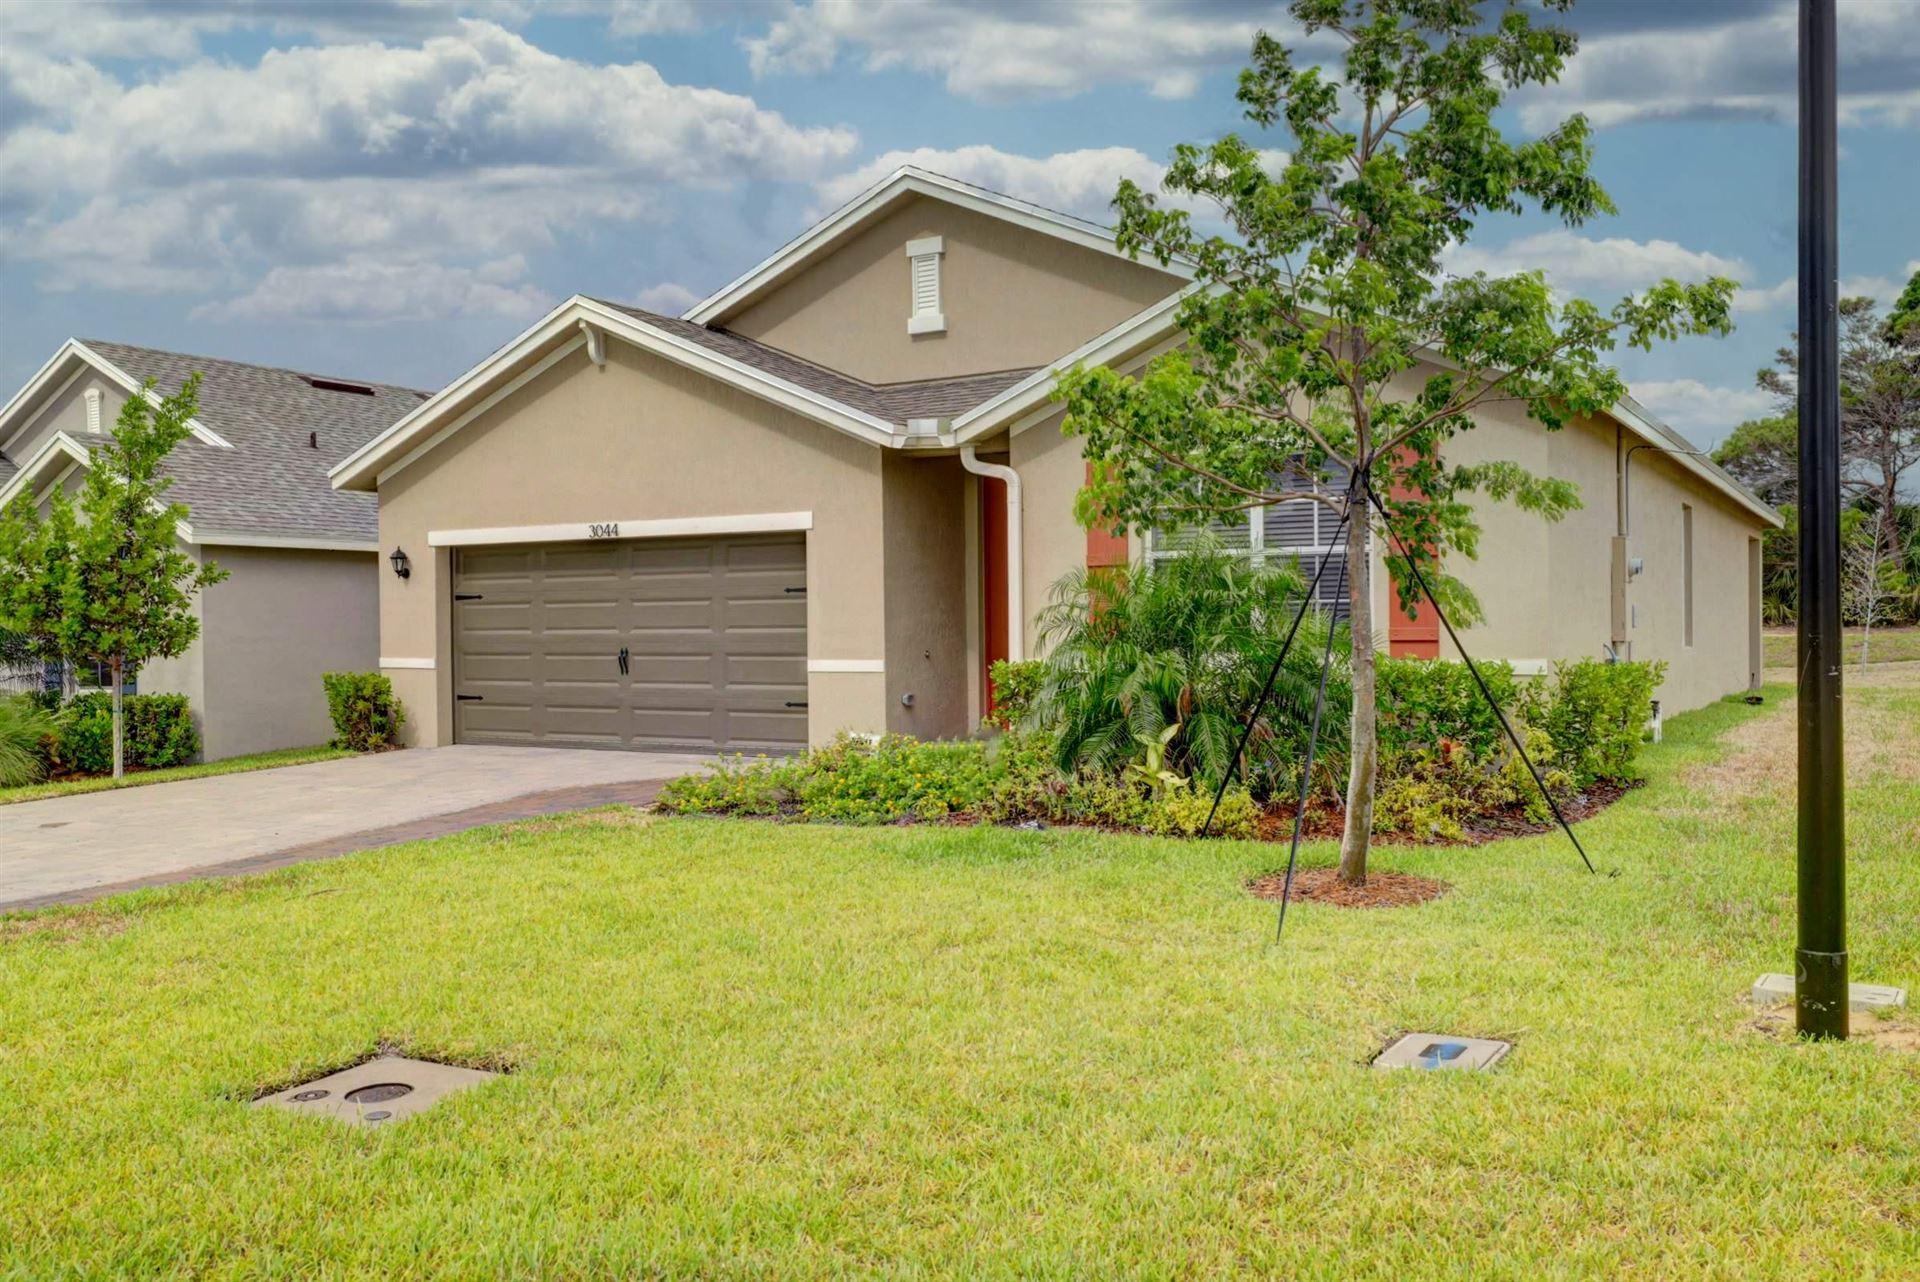 3044 NE Skyview Lane, Jensen Beach, FL 34957 - #: RX-10641800